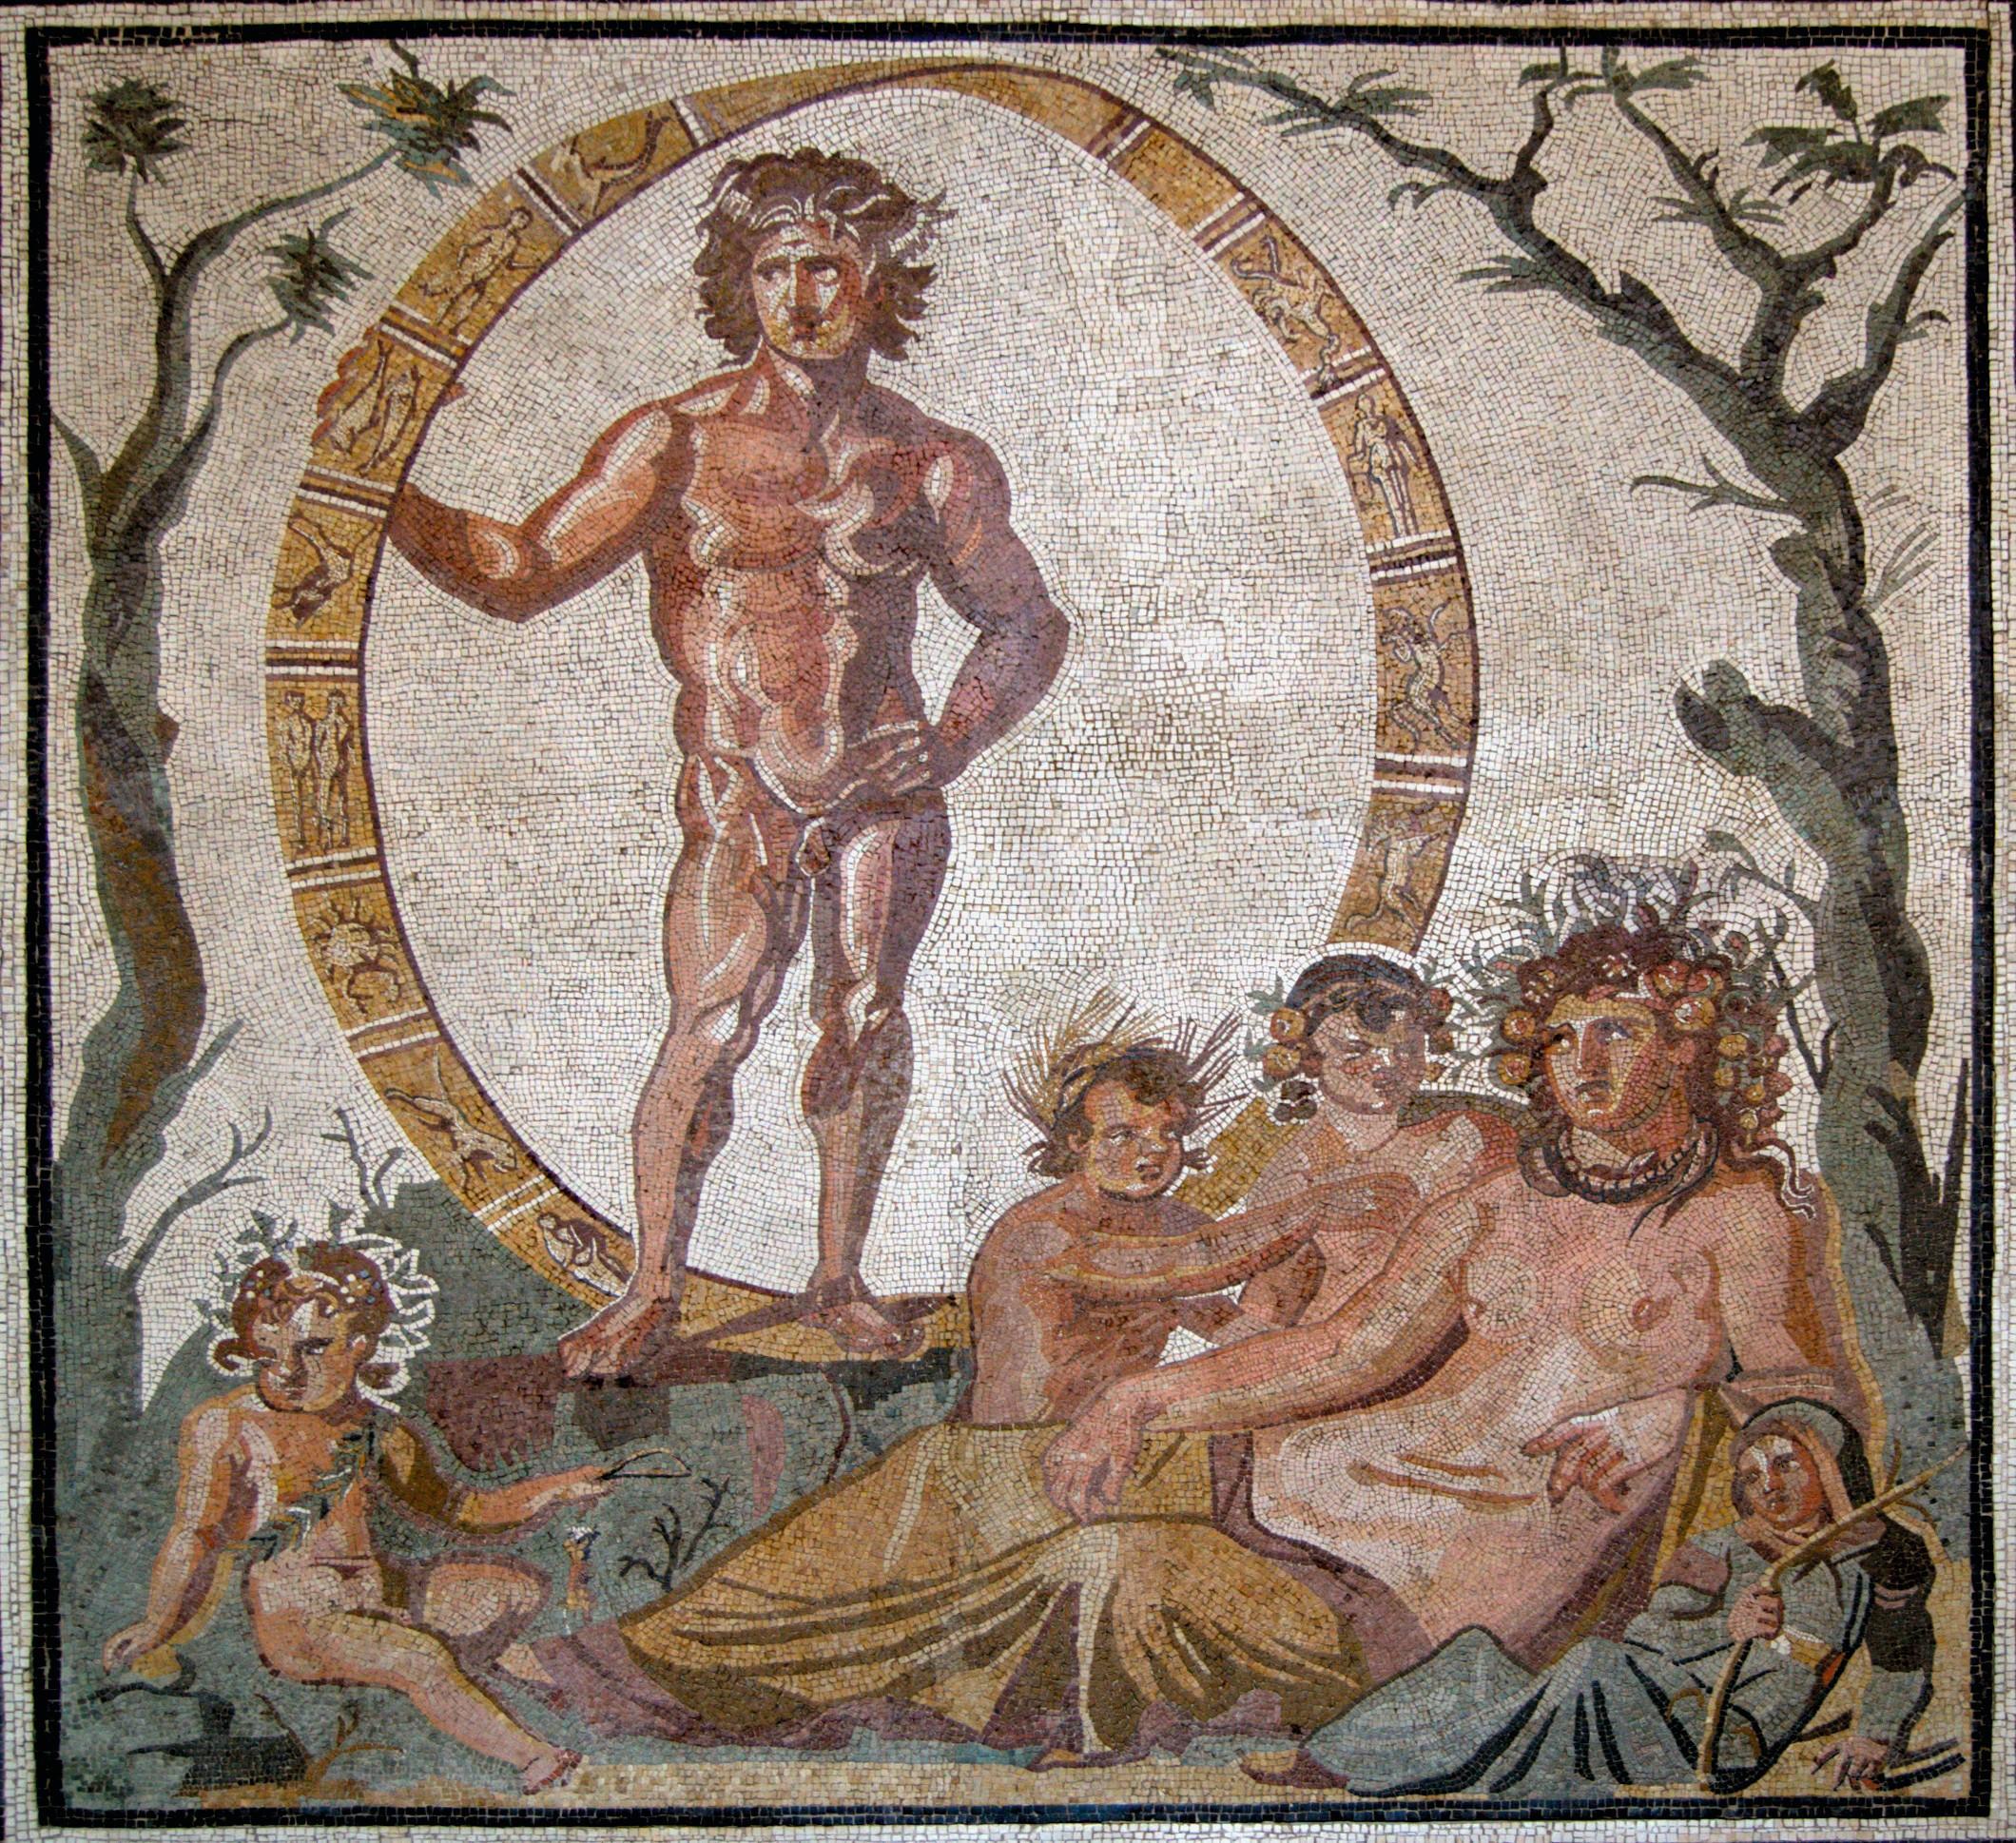 Chronos et Gaïa, mosaïque du IIIe siècle apr. J.-C.